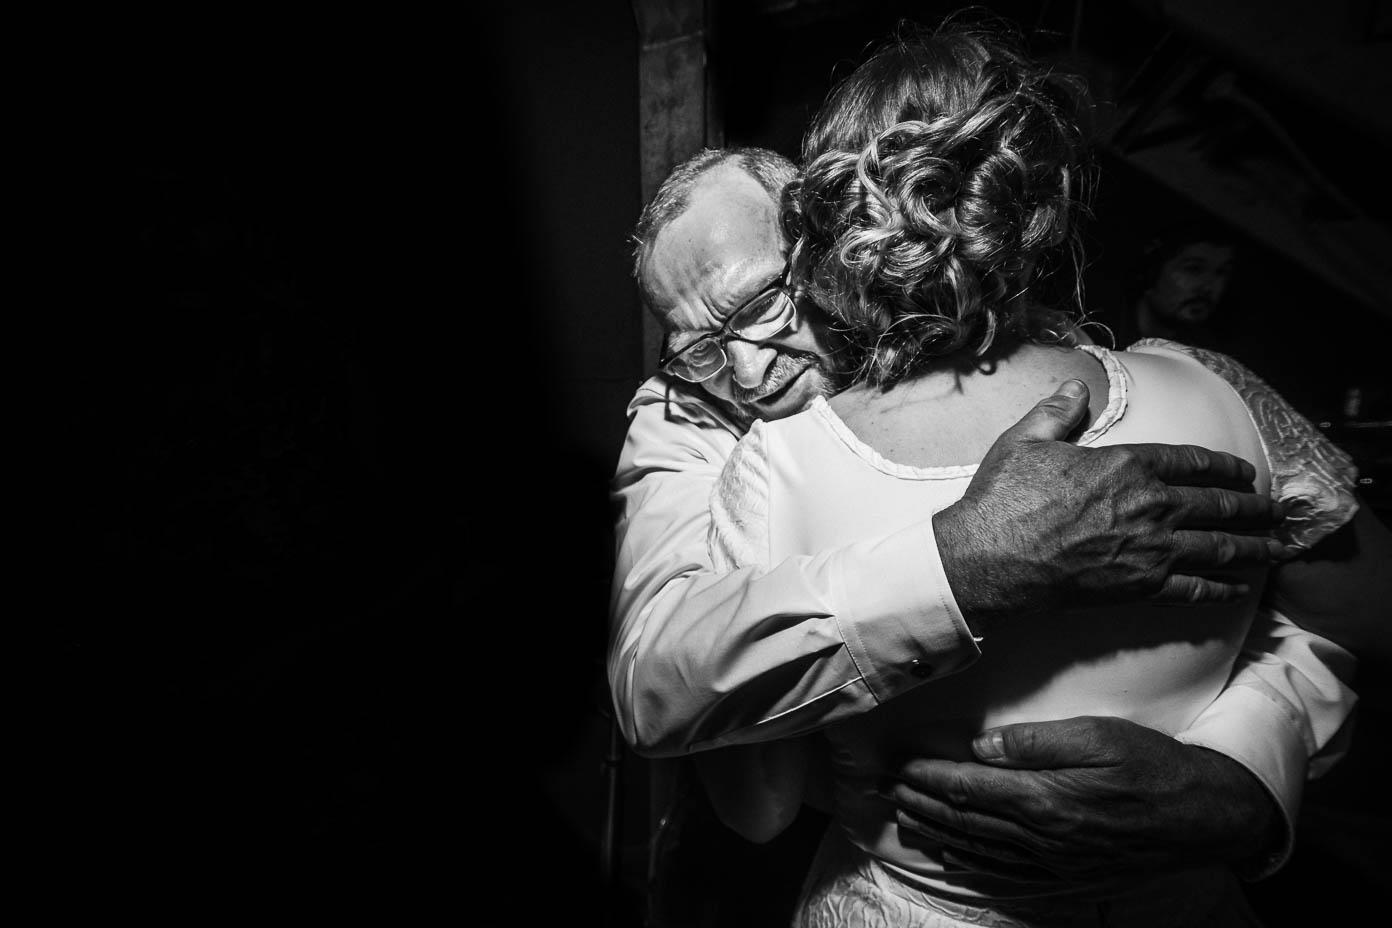 Brautvater umarmt die Braut.